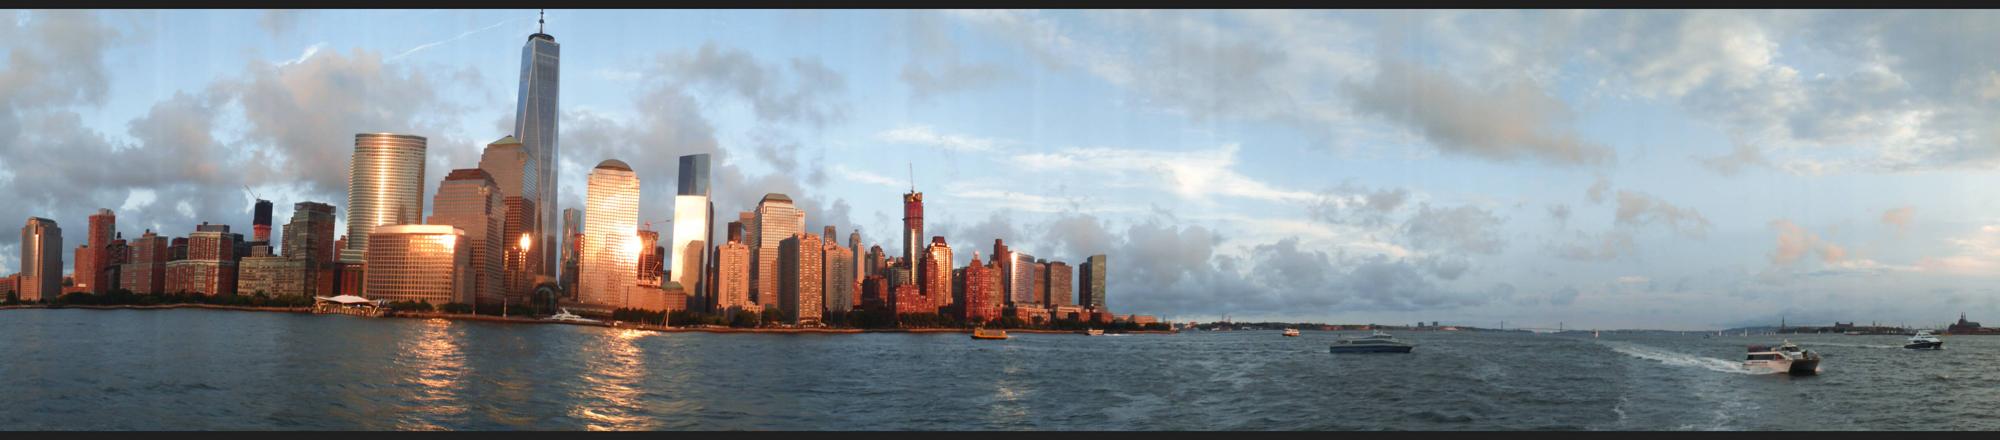 newyorkpanorama